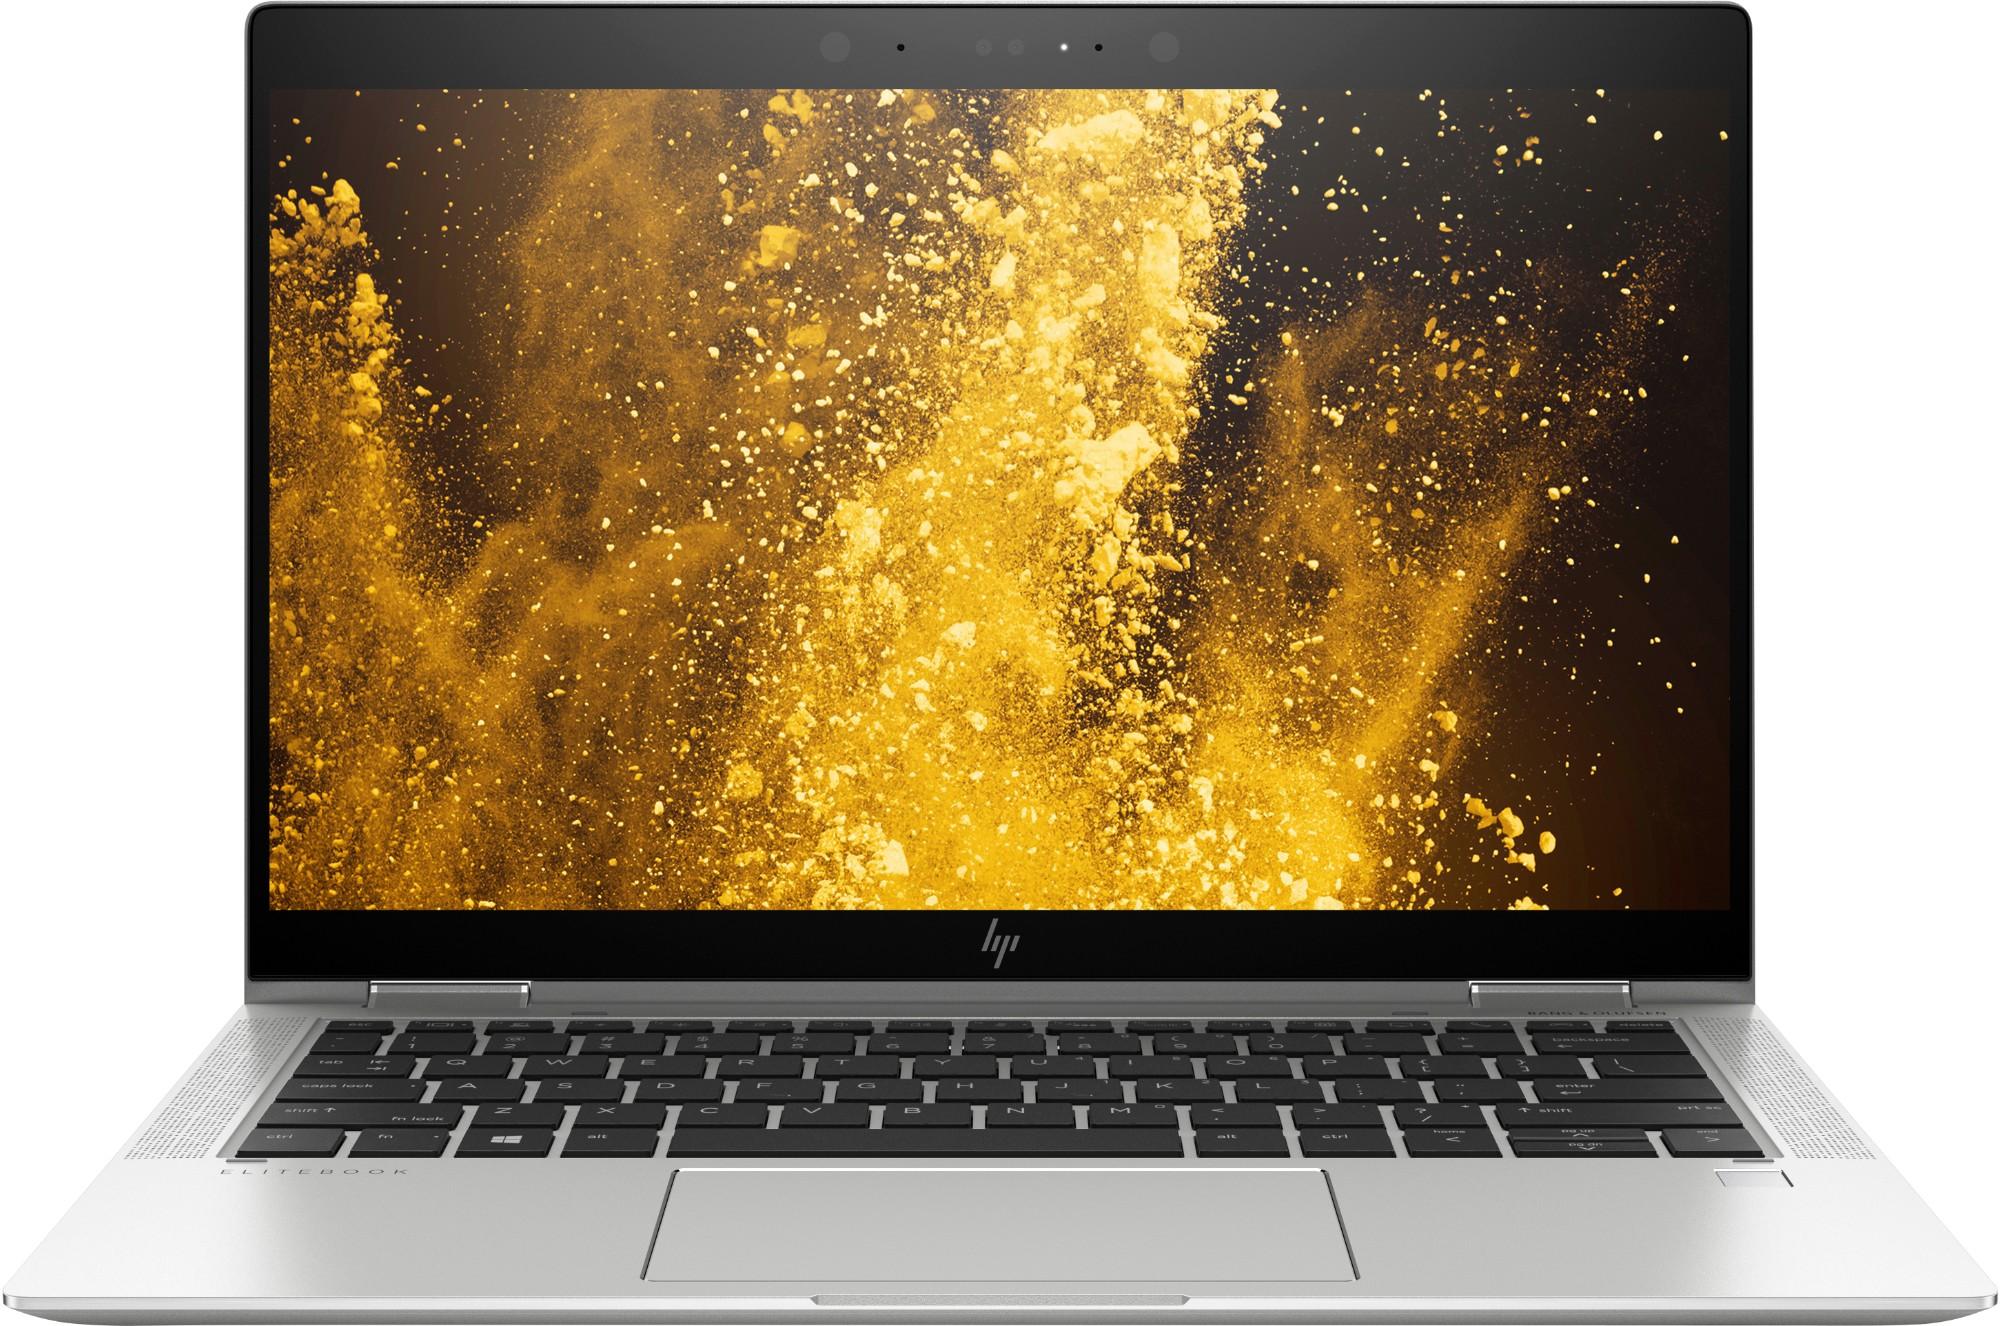 HP EliteBook x360 1030 G3 Hybrid (2-in-1) Silver 33.8 cm (13.3